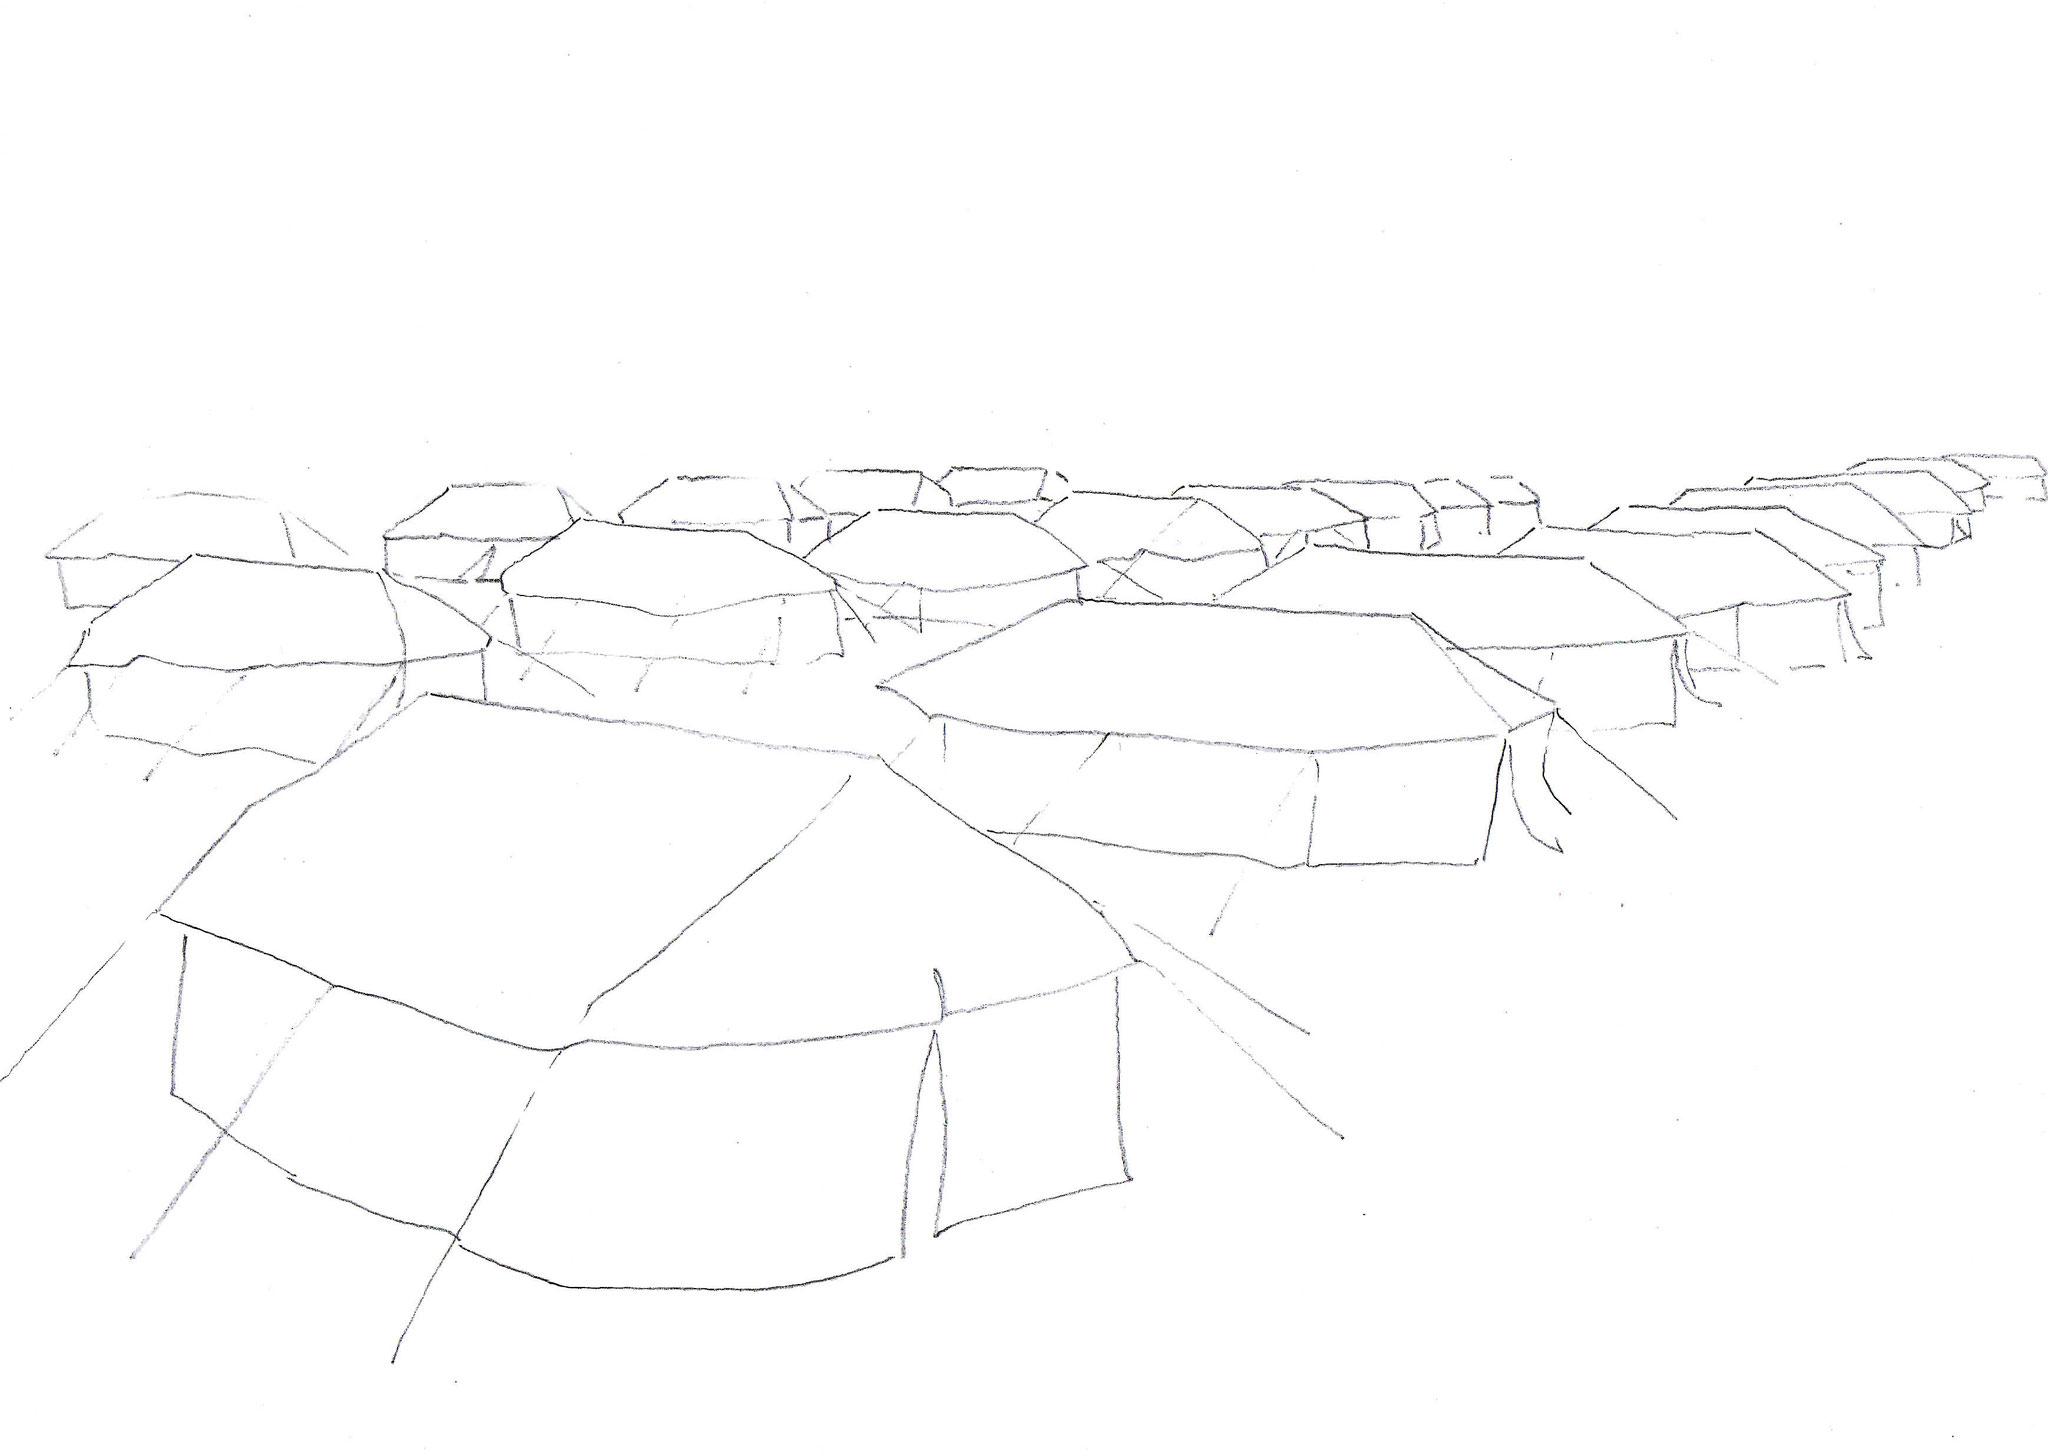 o.T., 21 cm x 29,7 cm, graphit/paper, 2013